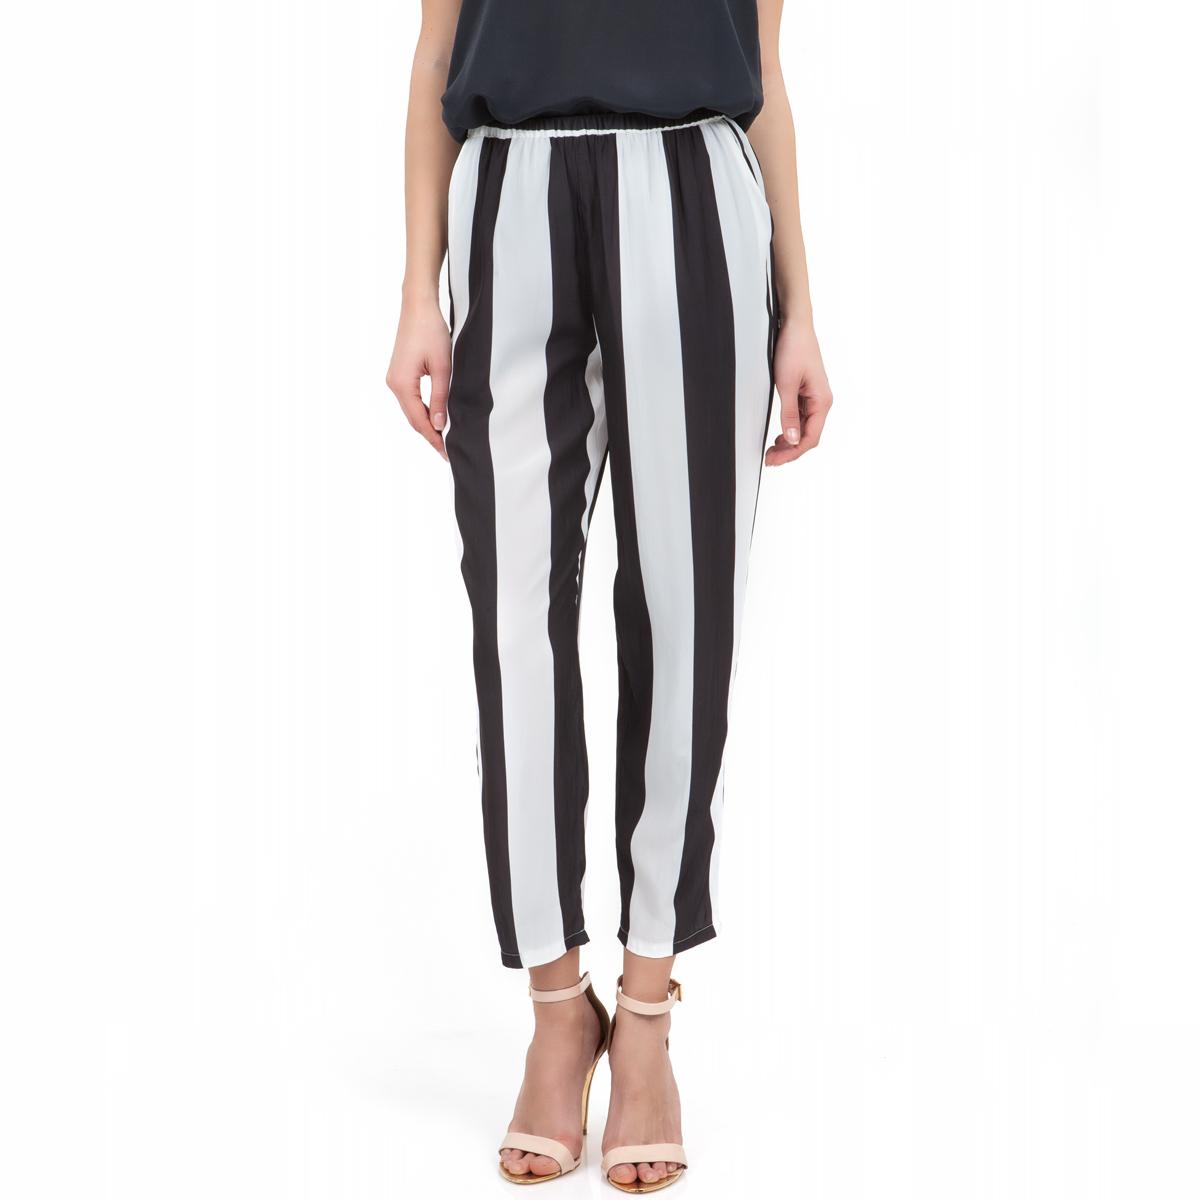 AMERICAN VINTAGE - Γυναικείο παντελόνι American Vintage λευκό-μαύρο γυναικεία ρούχα παντελόνια casual